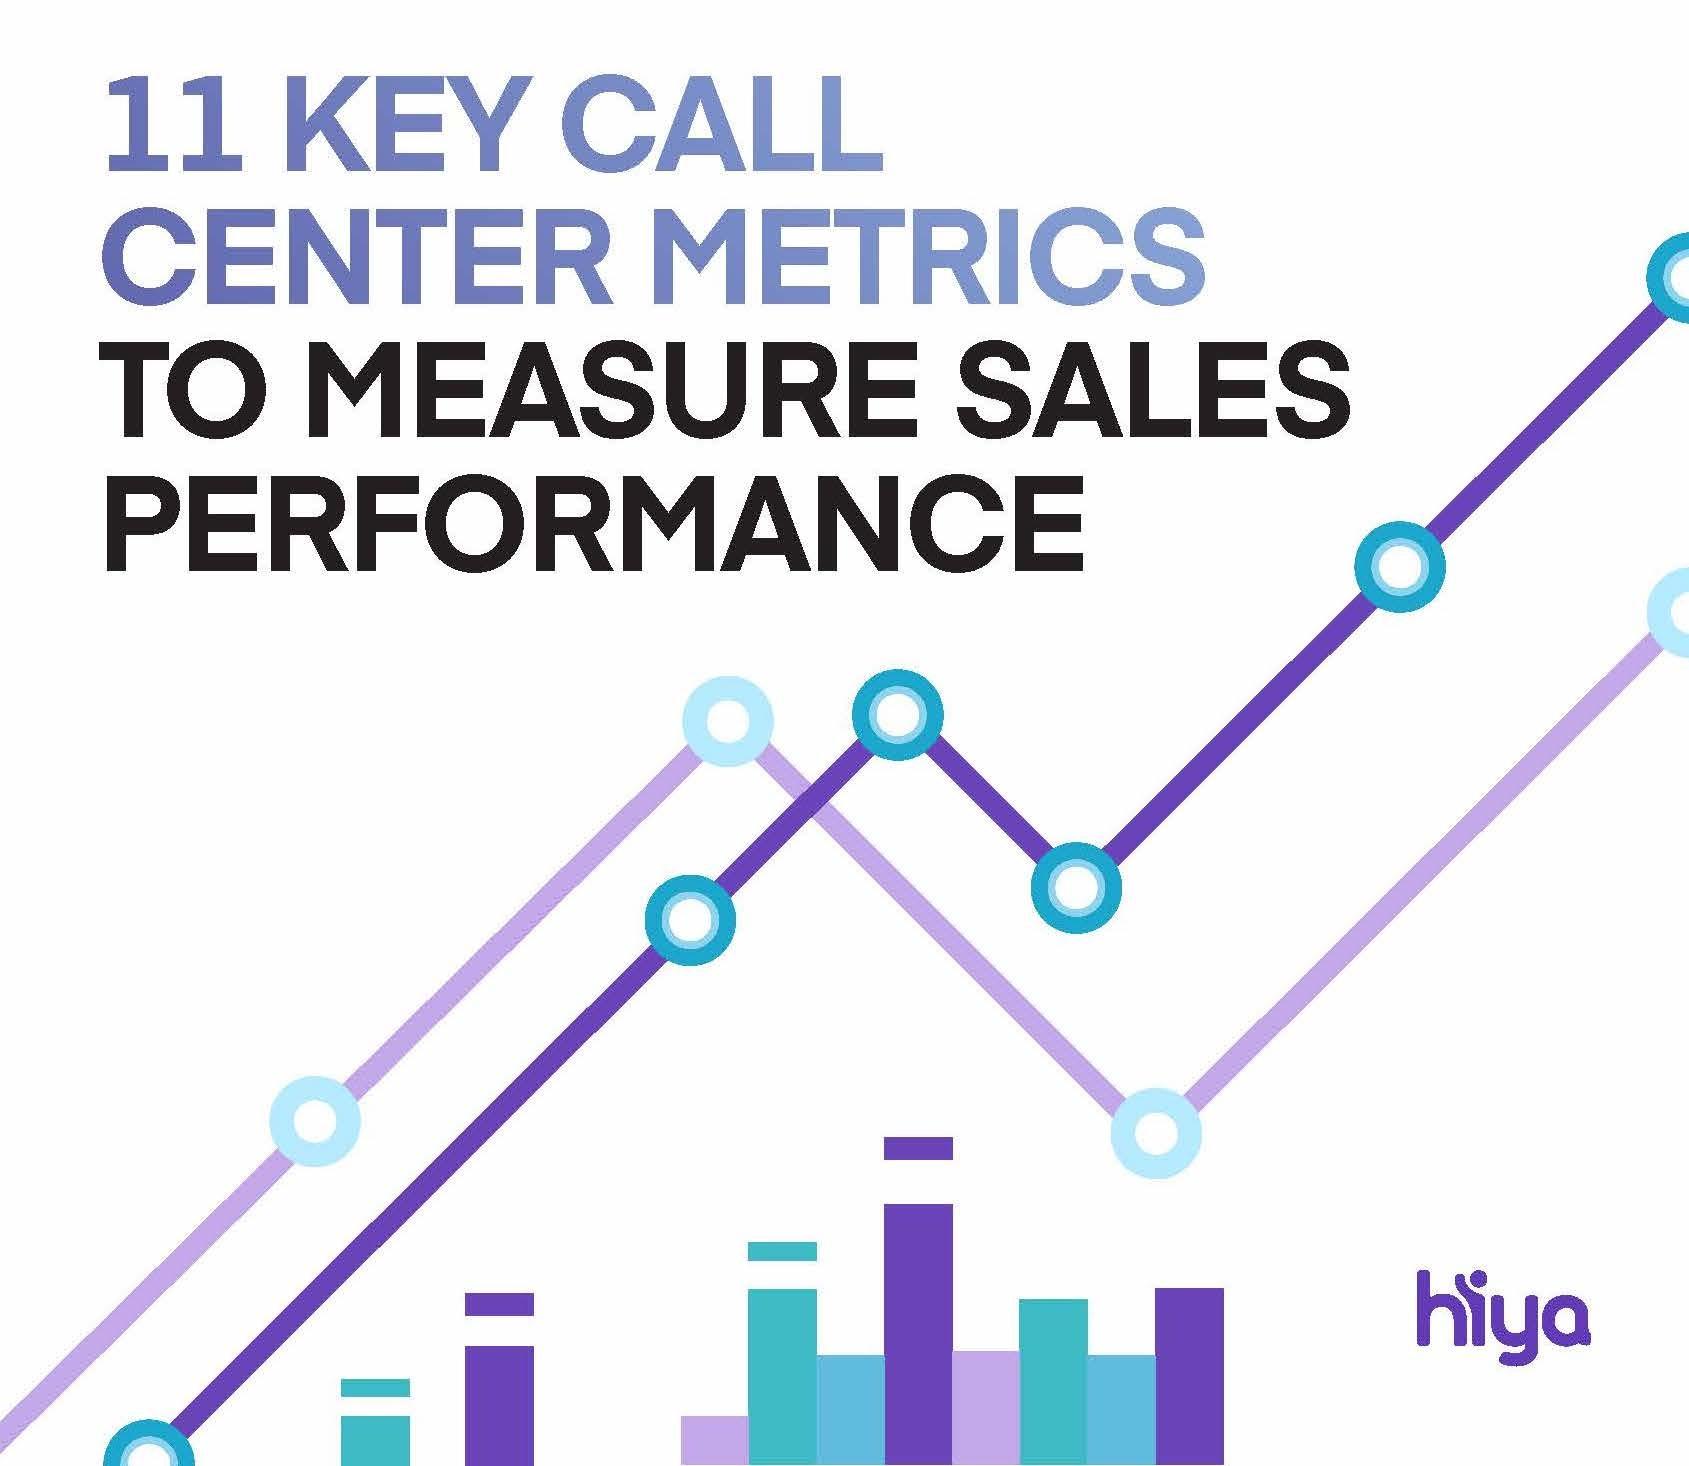 11 Key Call Center Metrics cover_Page_01 copy